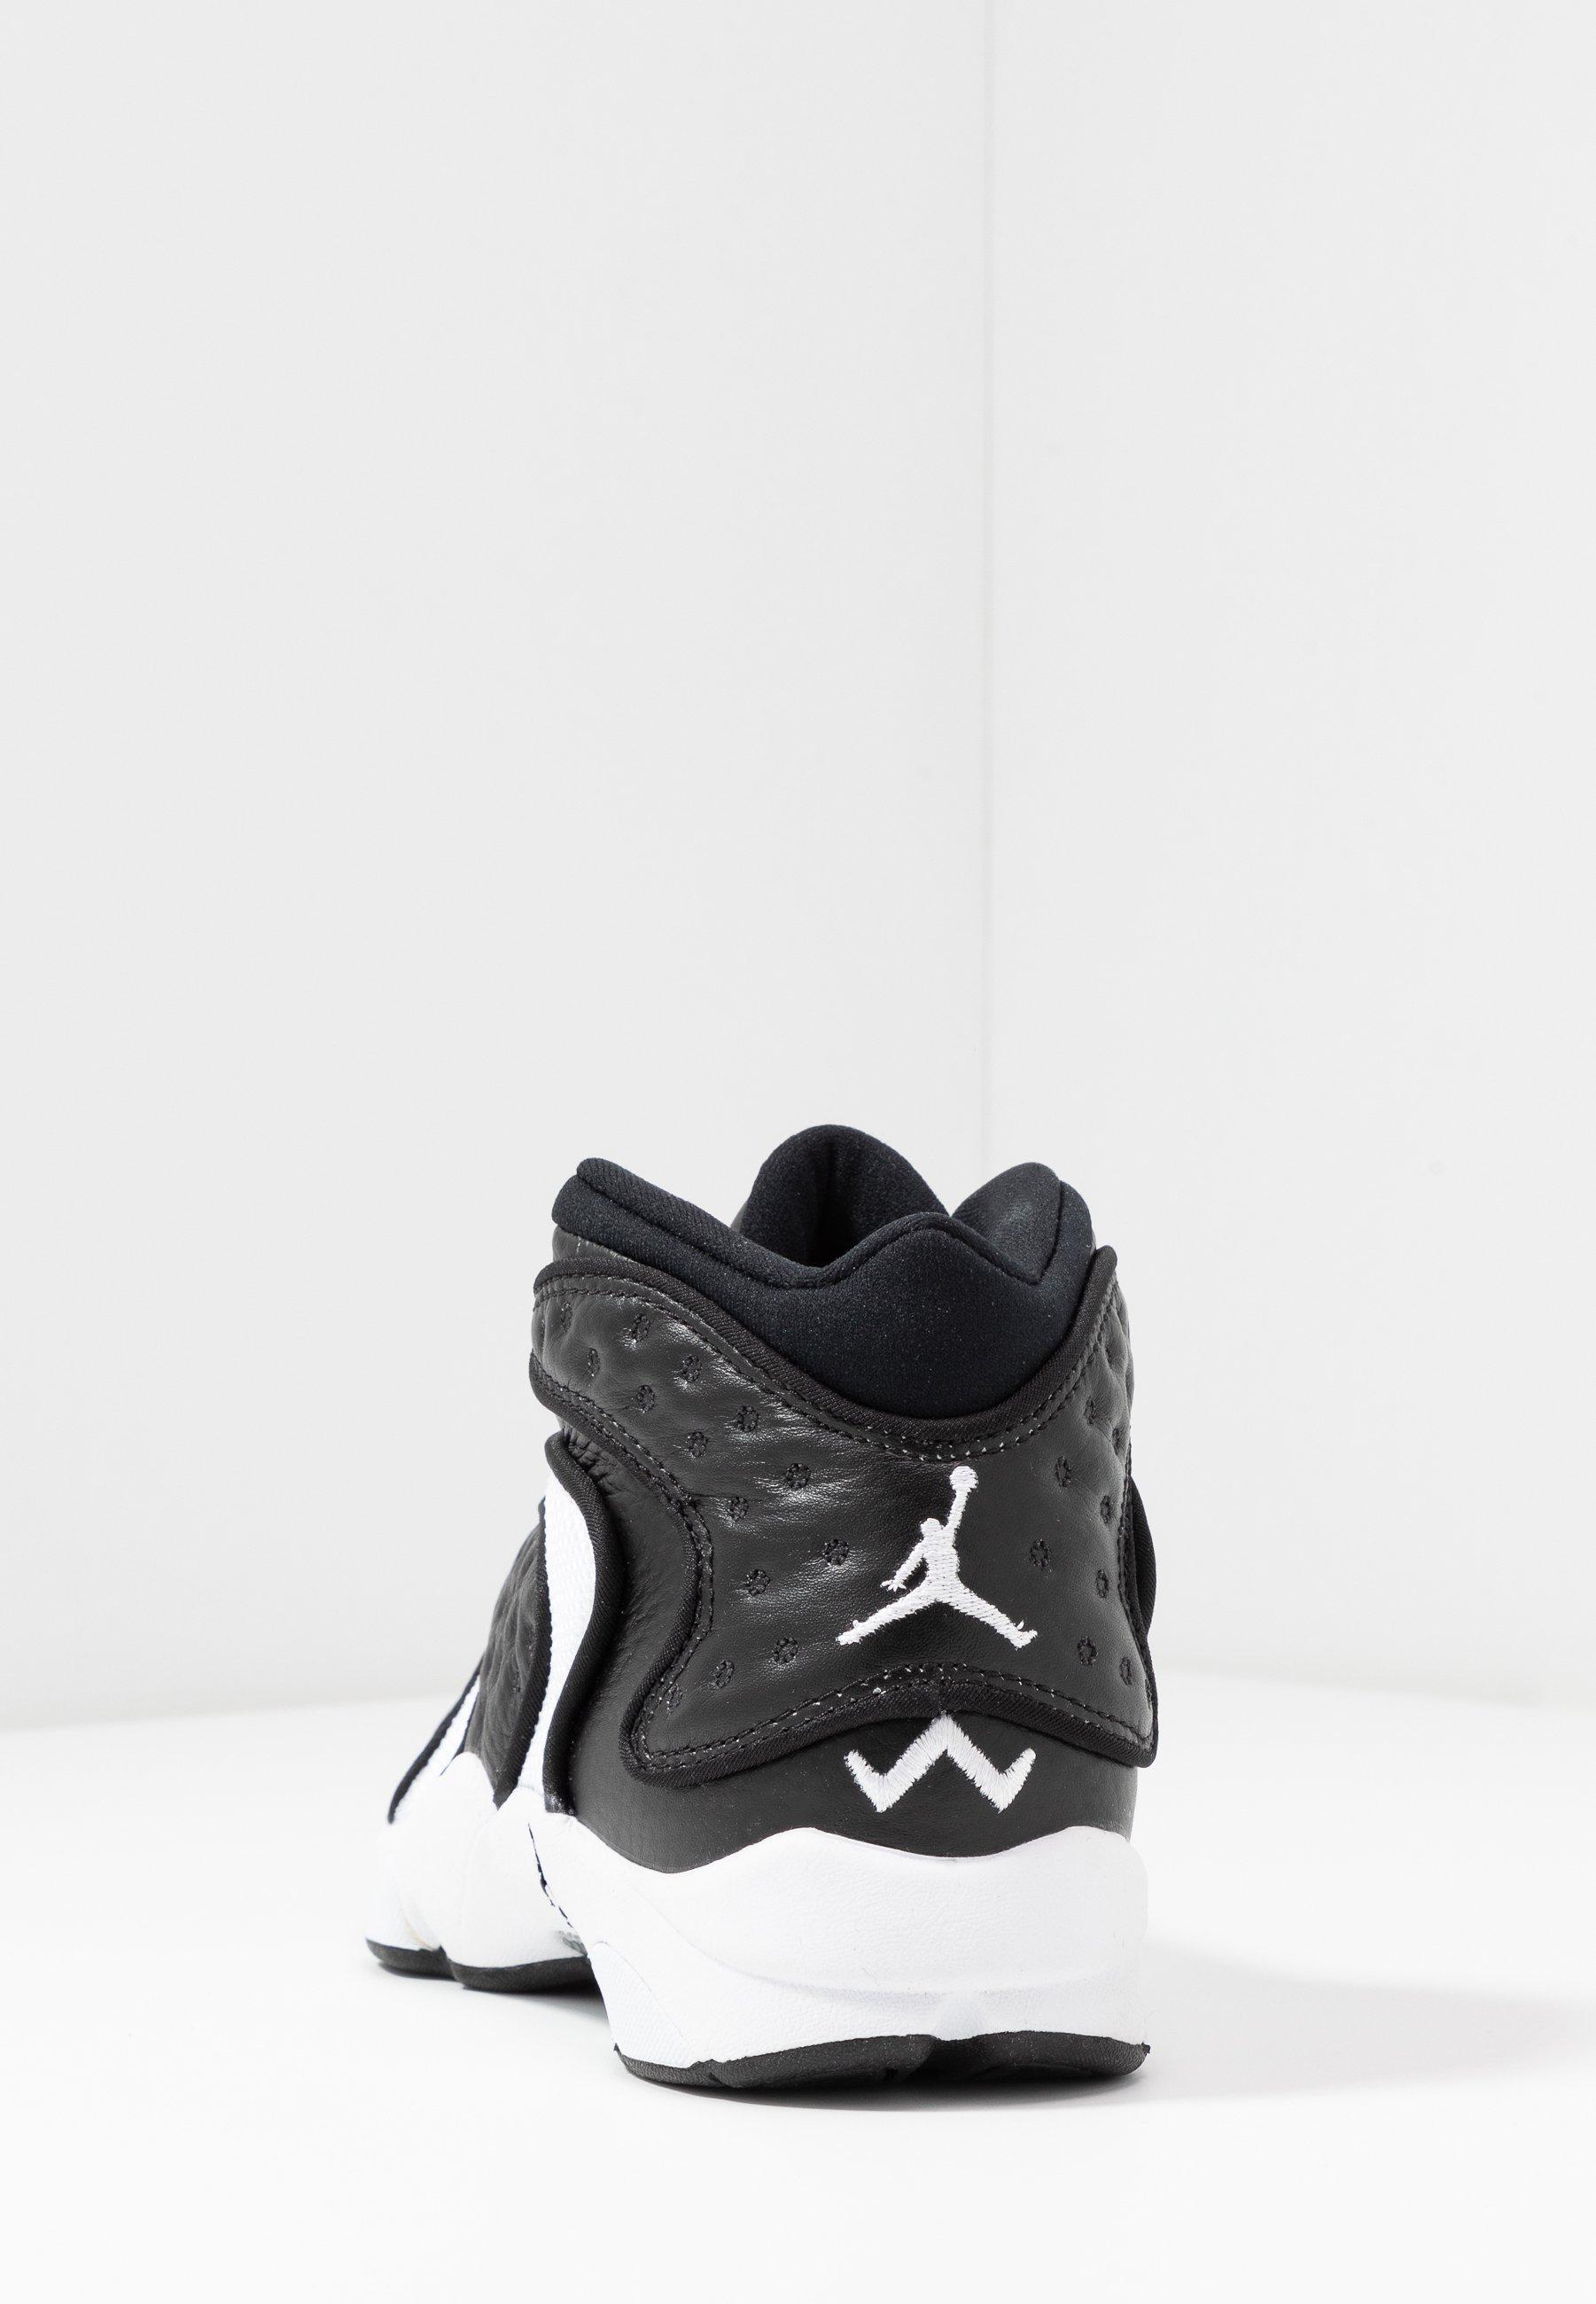 Air Jordan OG Damenschuh Höga sneakers blackwhitewhite